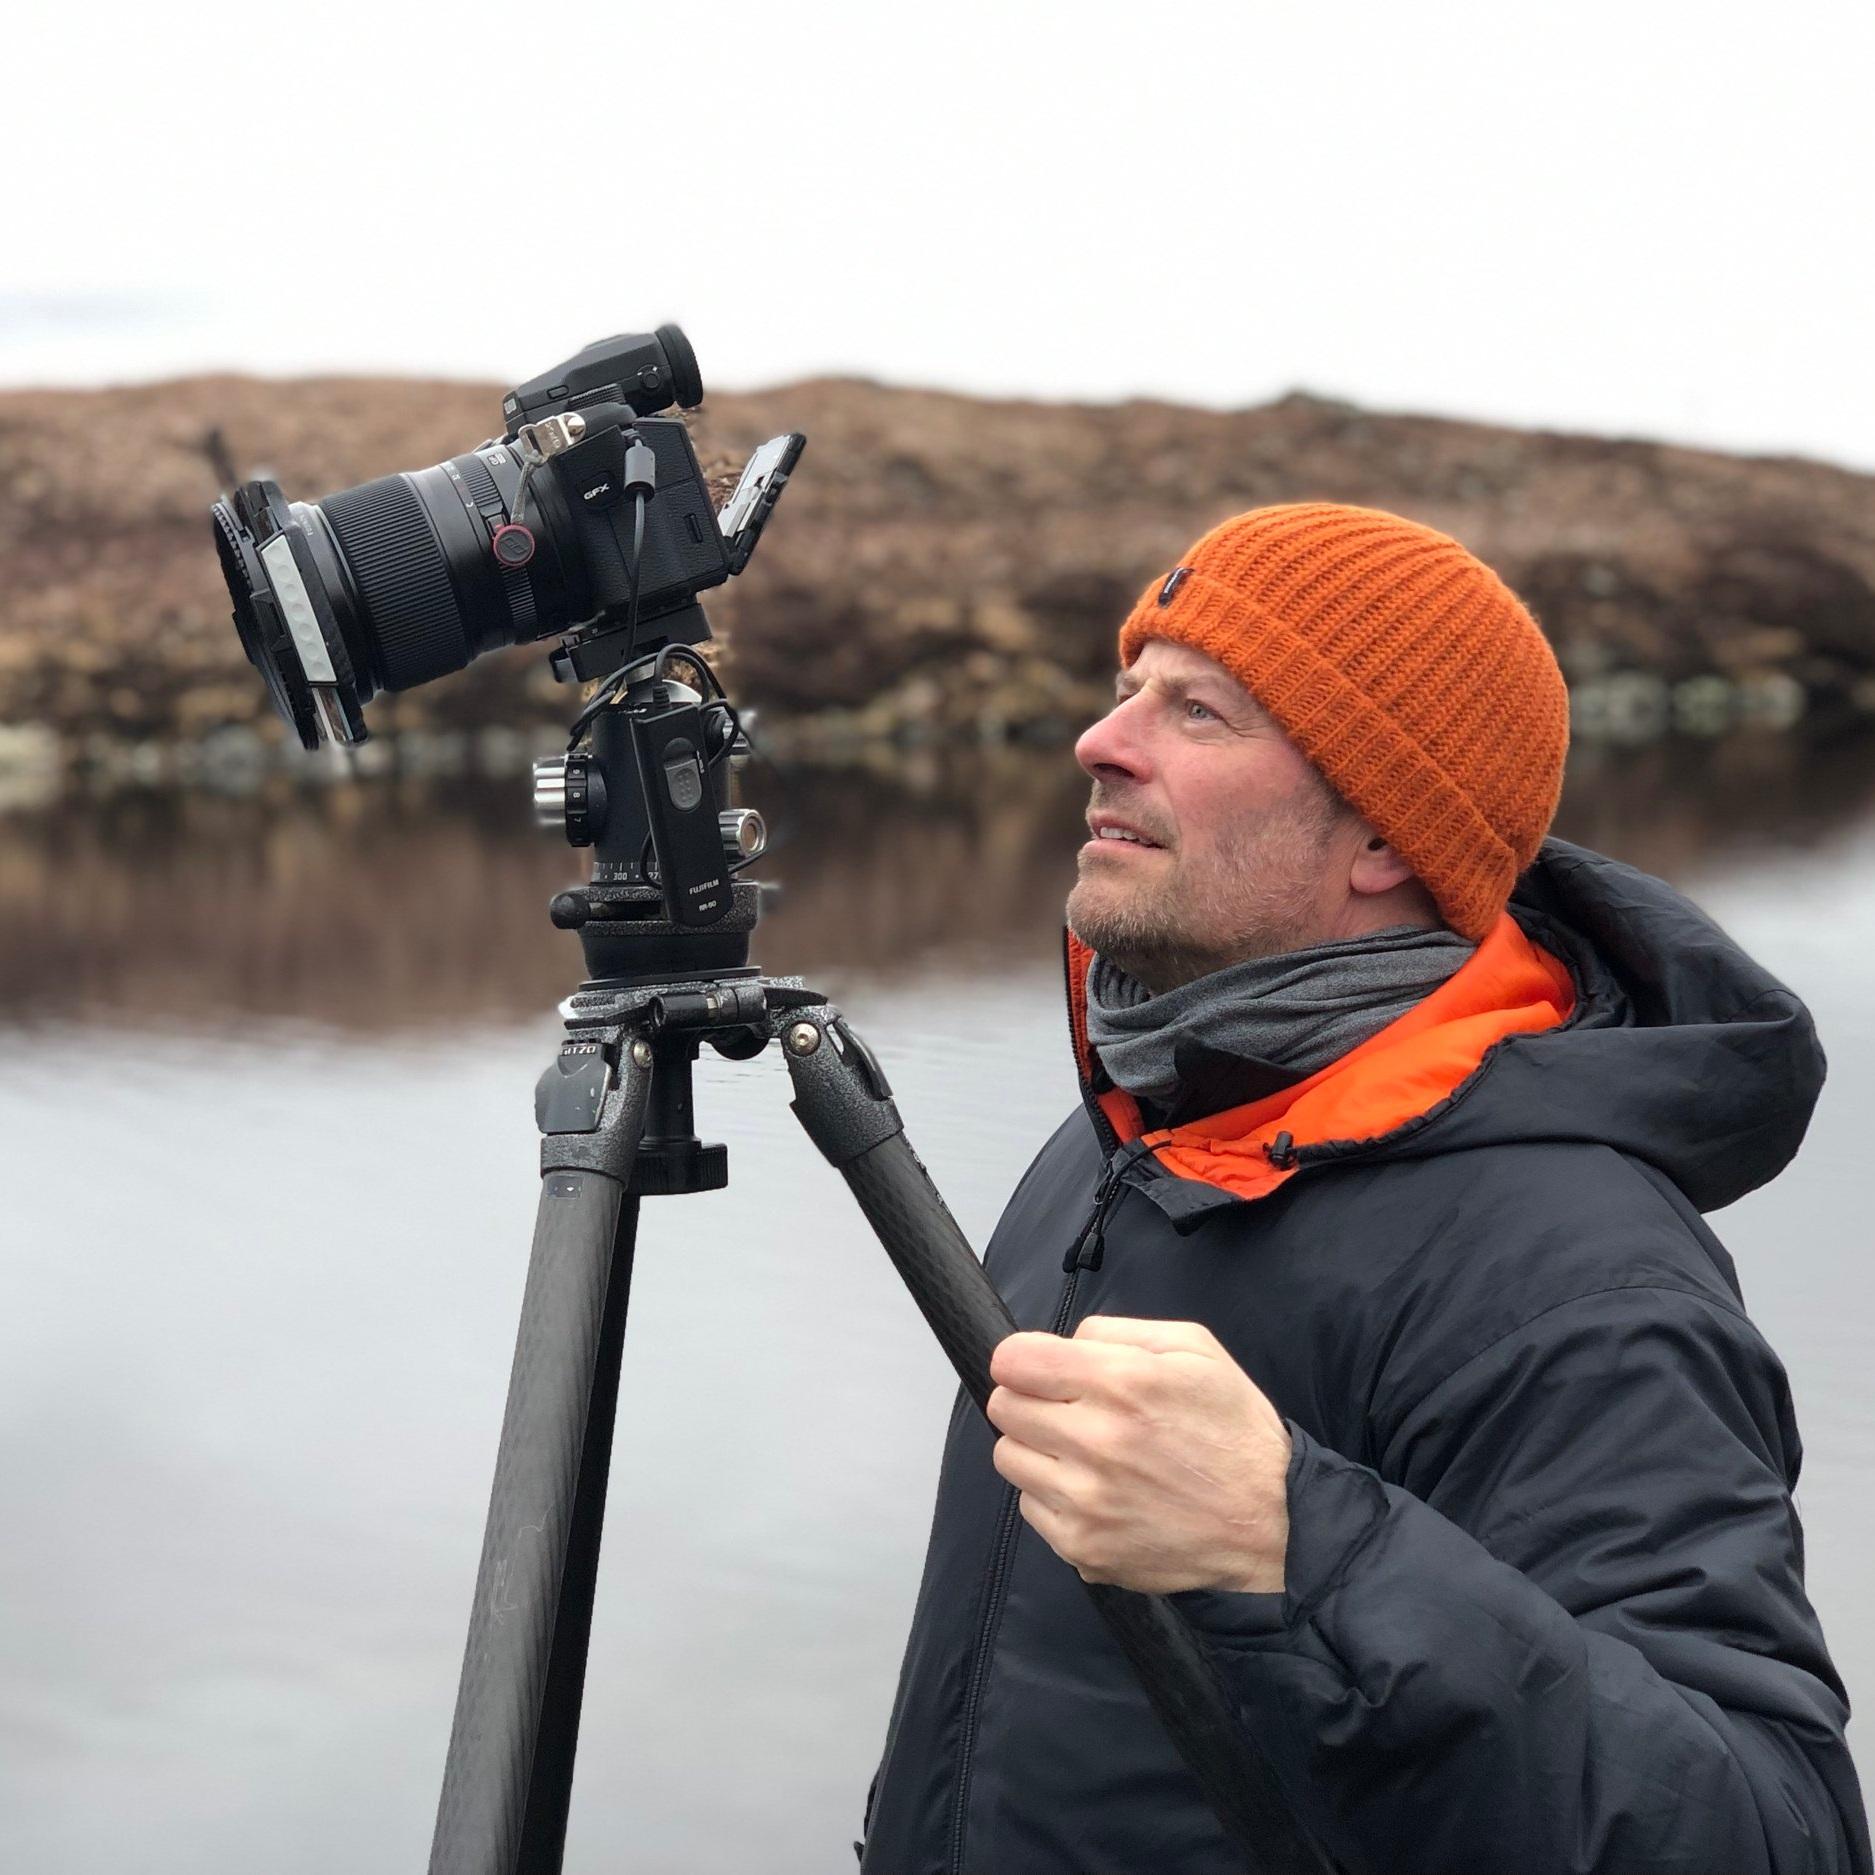 Paul Sanders landscape photographer, mindful photography expert